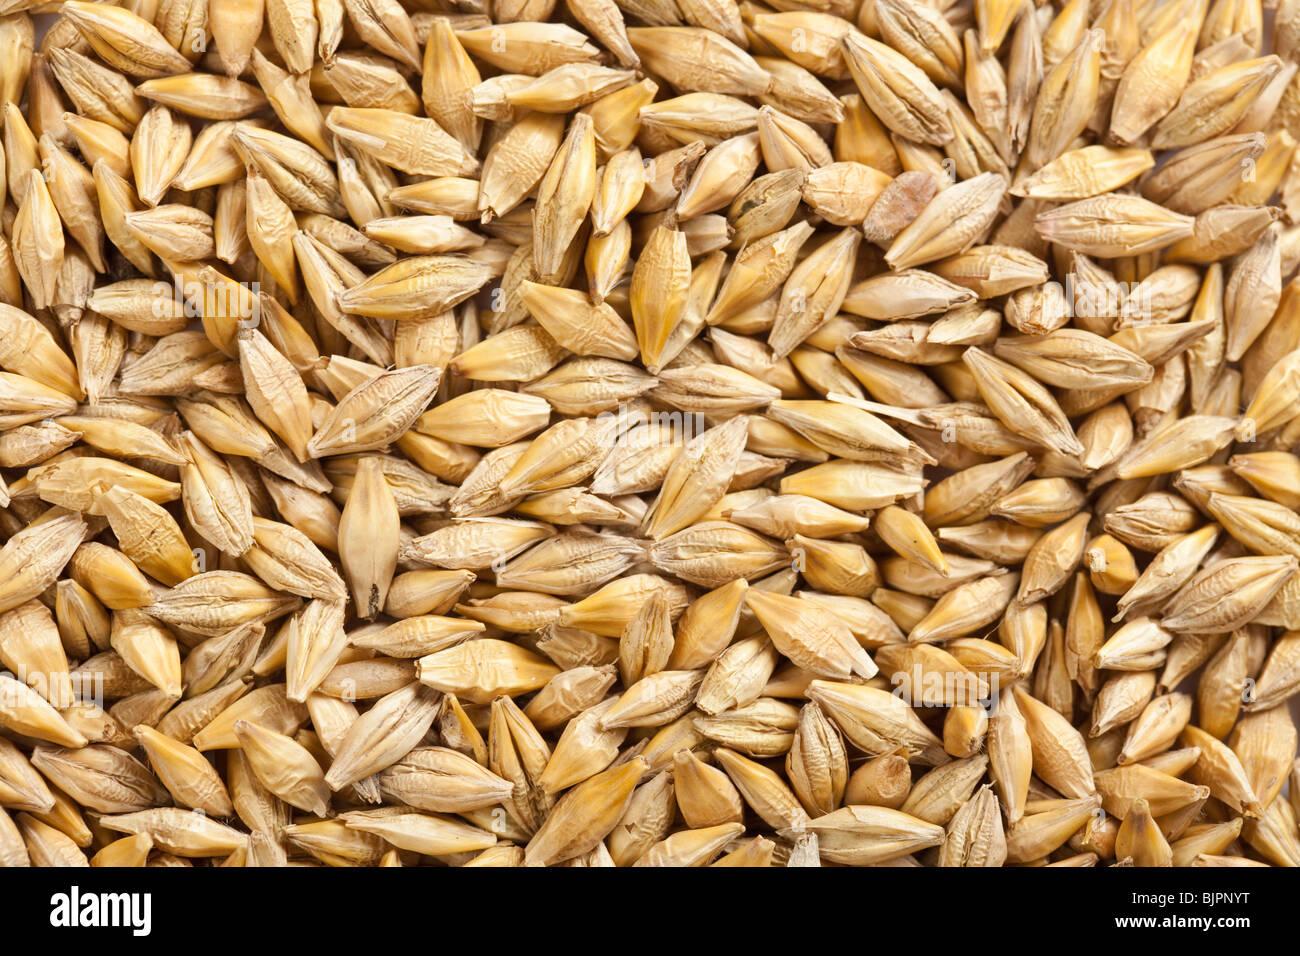 barley grain - Stock Image